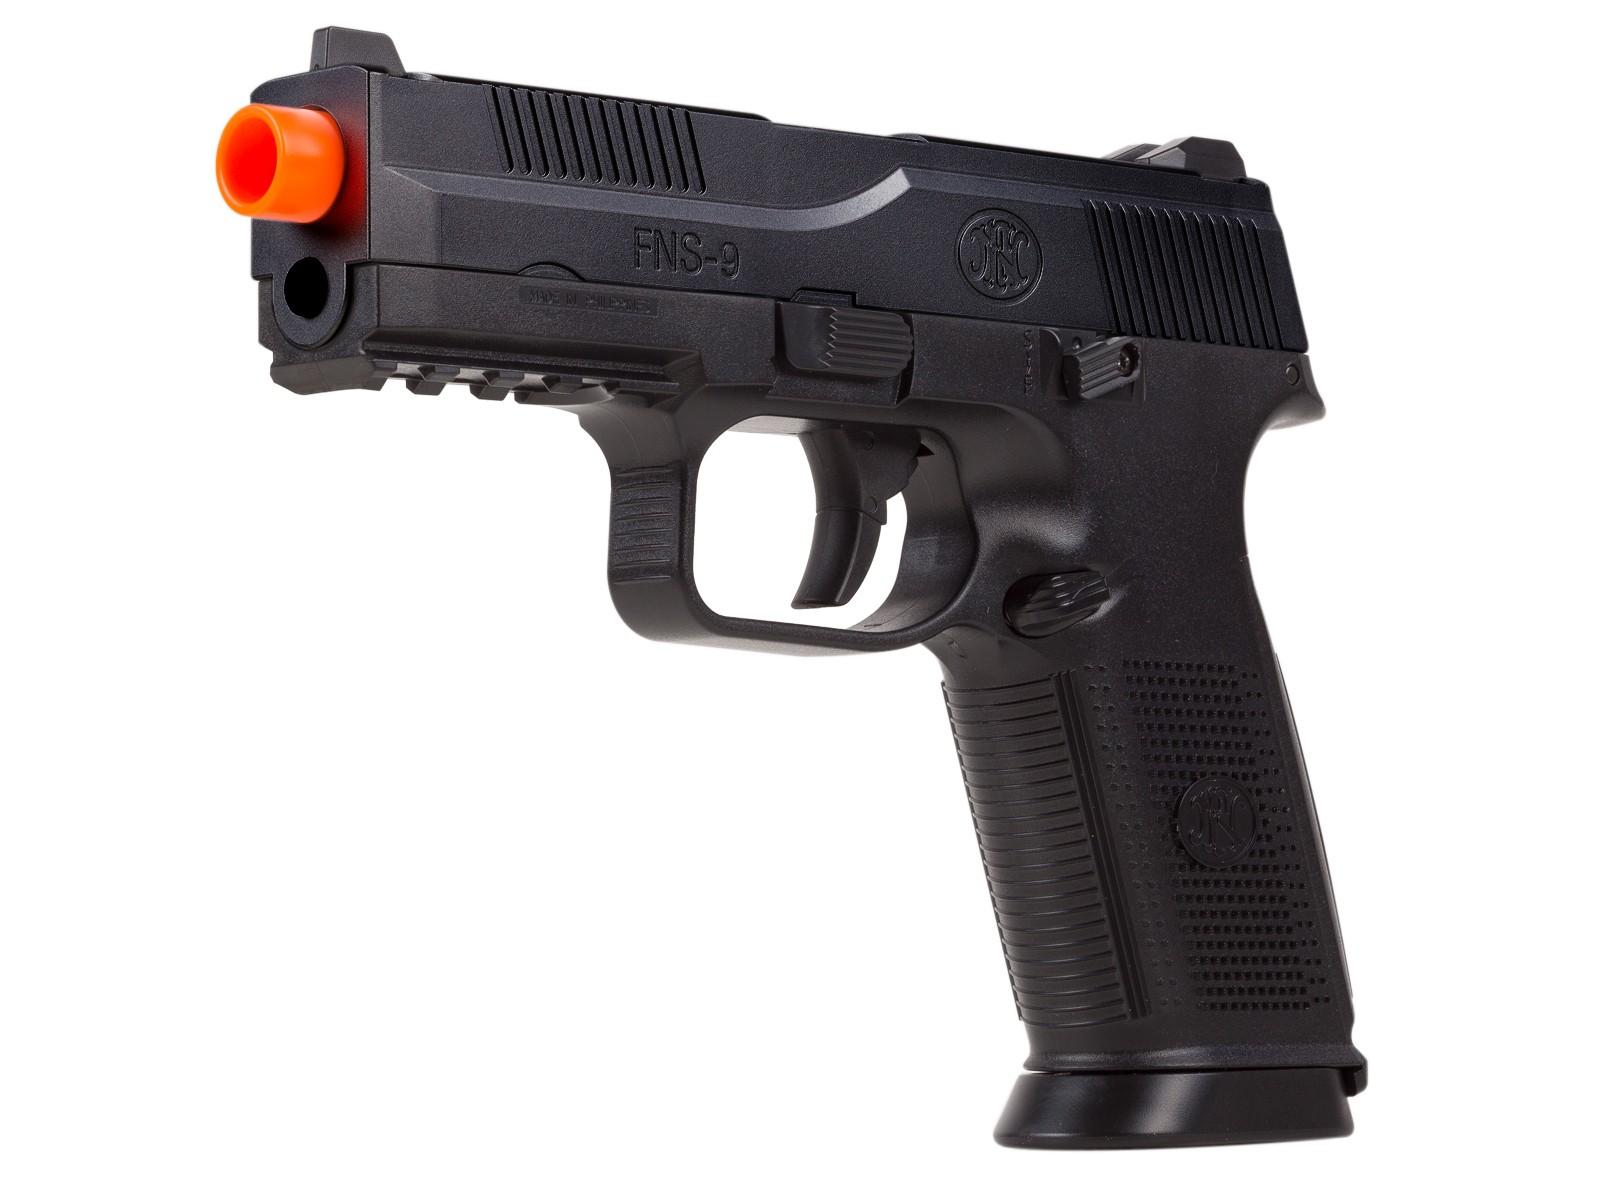 FN_Herstal_FNS9_Spring_Airsoft_Pistol_Black_6mm